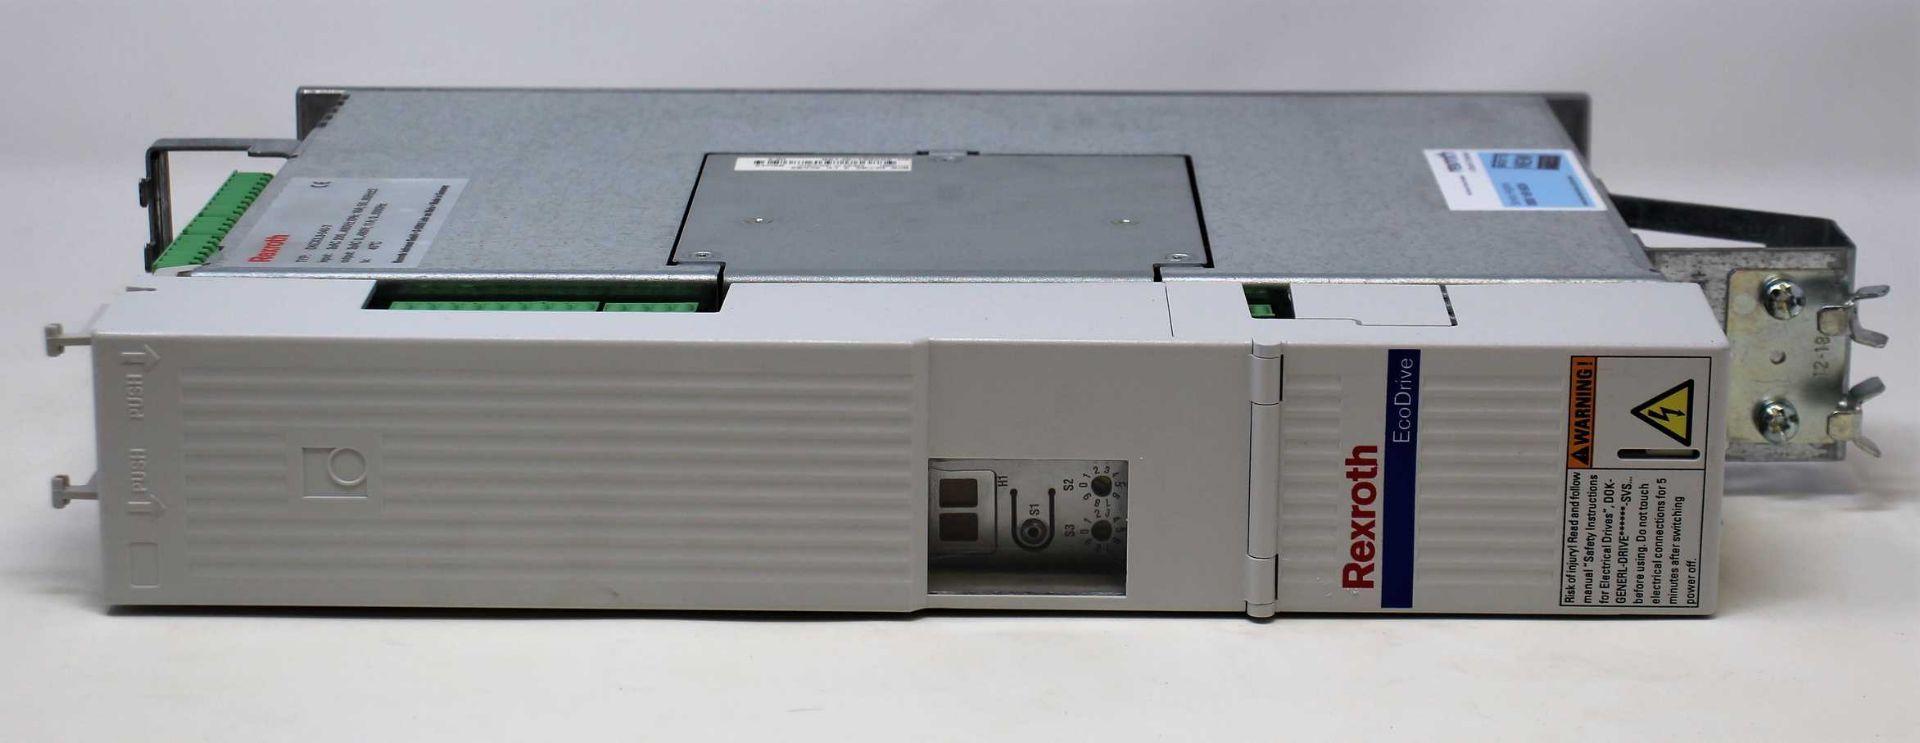 A pre-owned Rexroth Indramat Ecodrive Dkcxx.3-040-7 AC Servo Drive (DKCXX30407 DKC02.3 LK SCK02) (